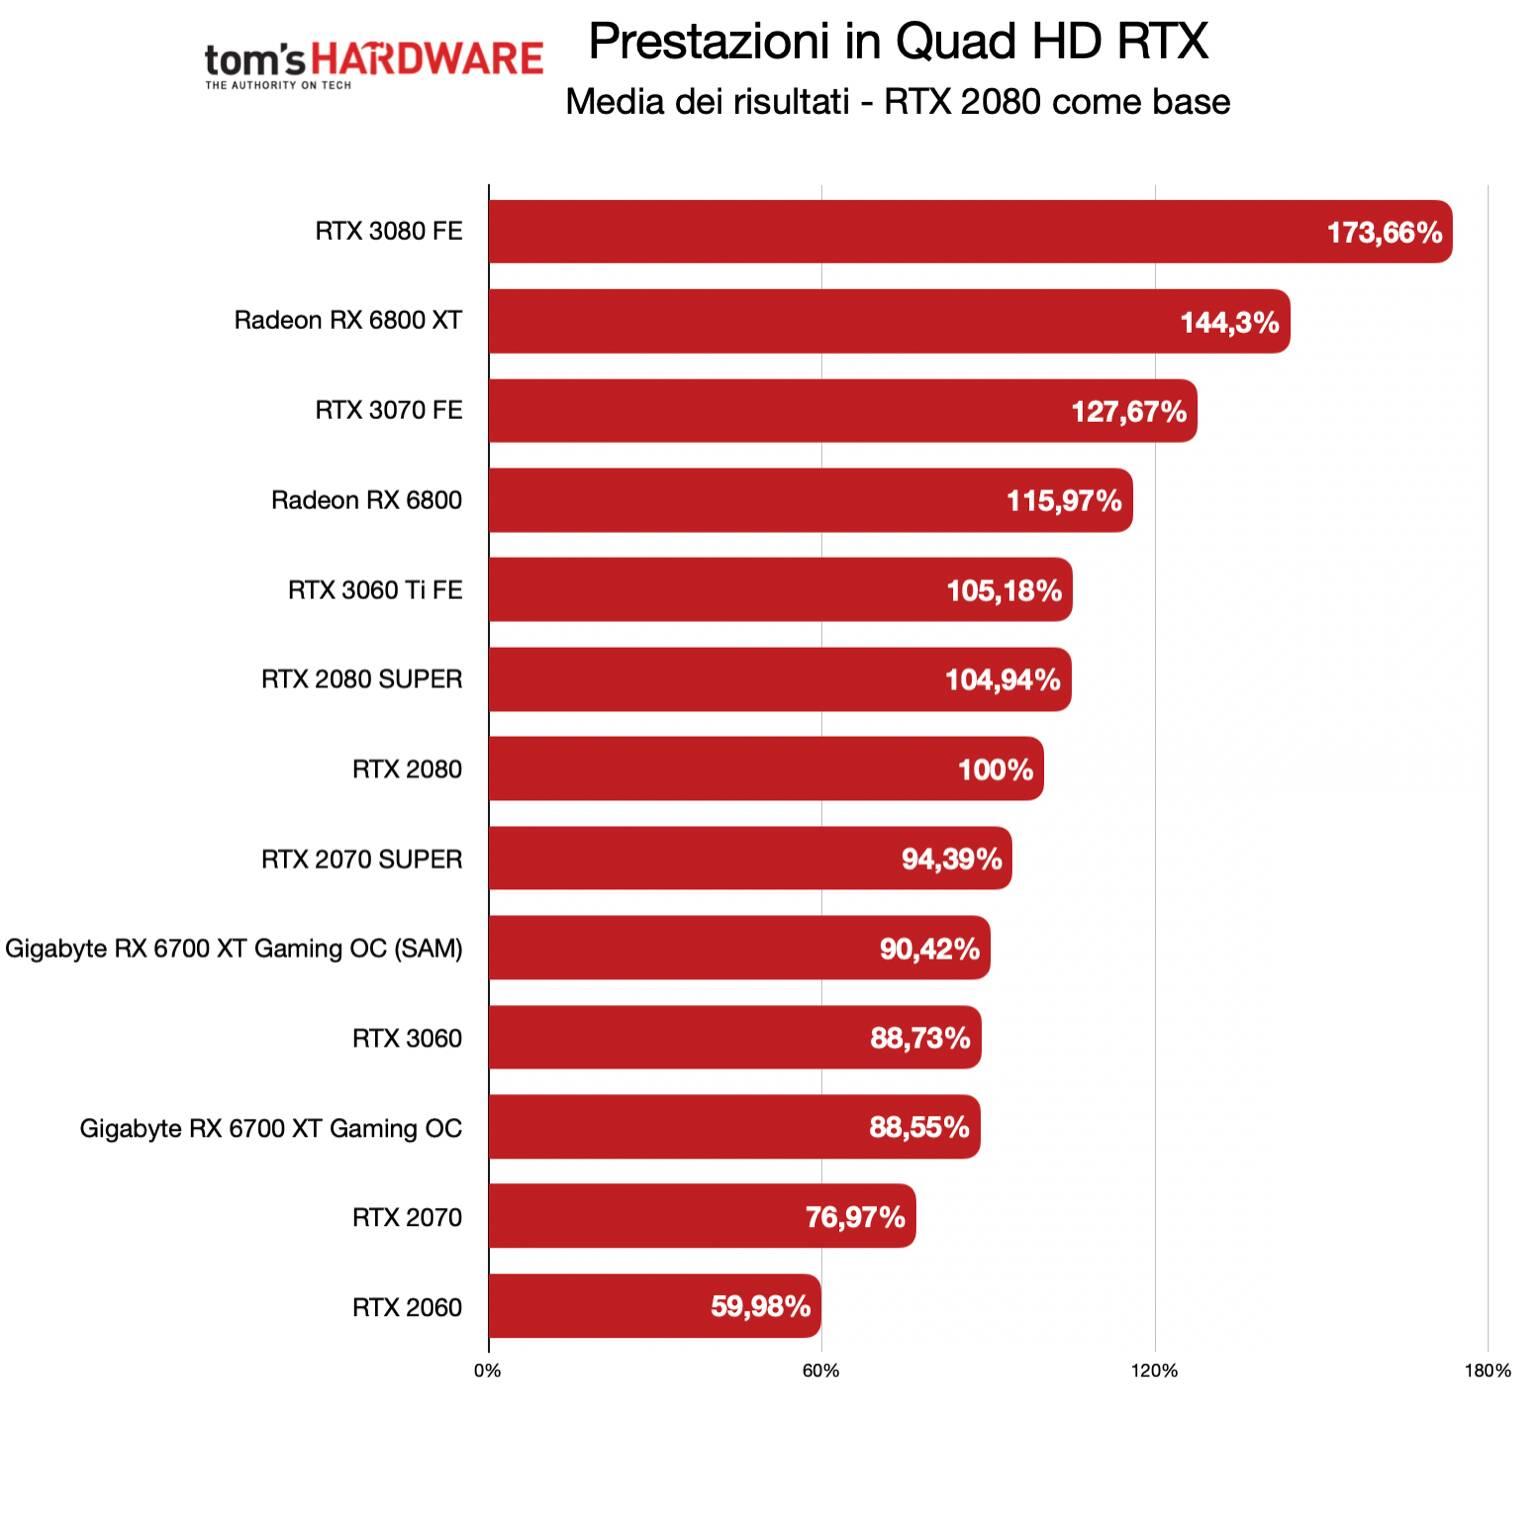 Benchmark Gigabyte RX 6700 XT Gaming OC - QHD RTX - Diff. % RTX 2080